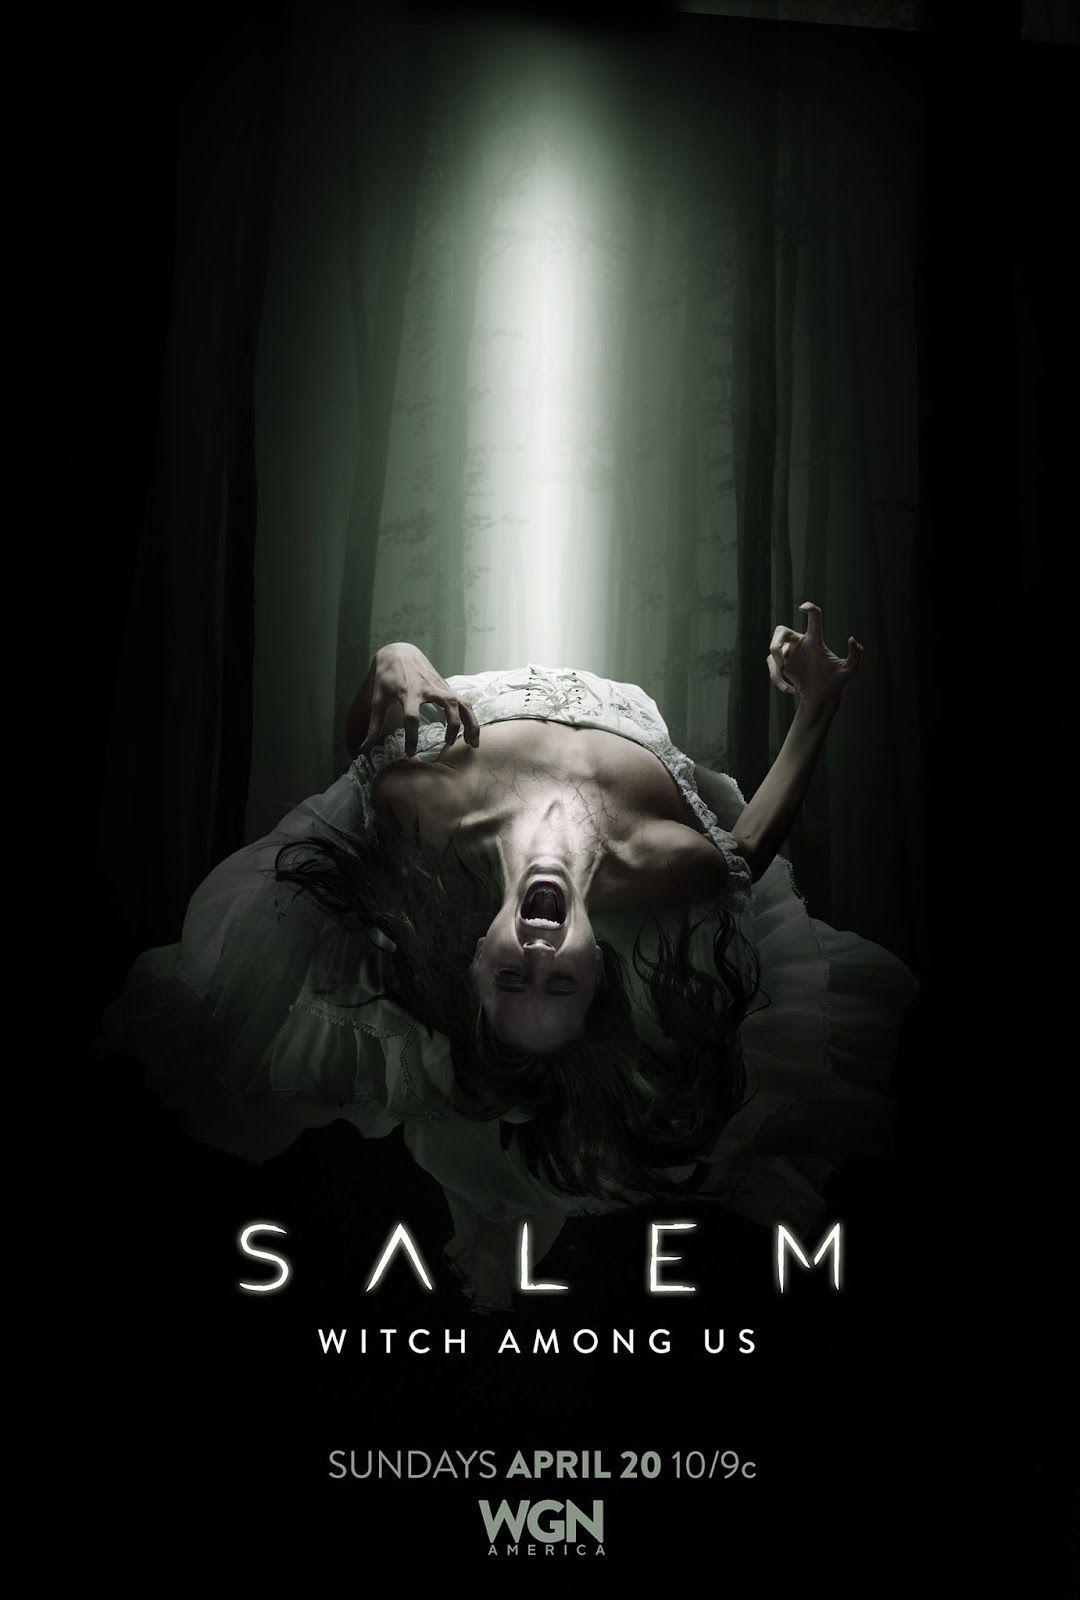 salem tv series httpwwwimdbcomtitlett2963254